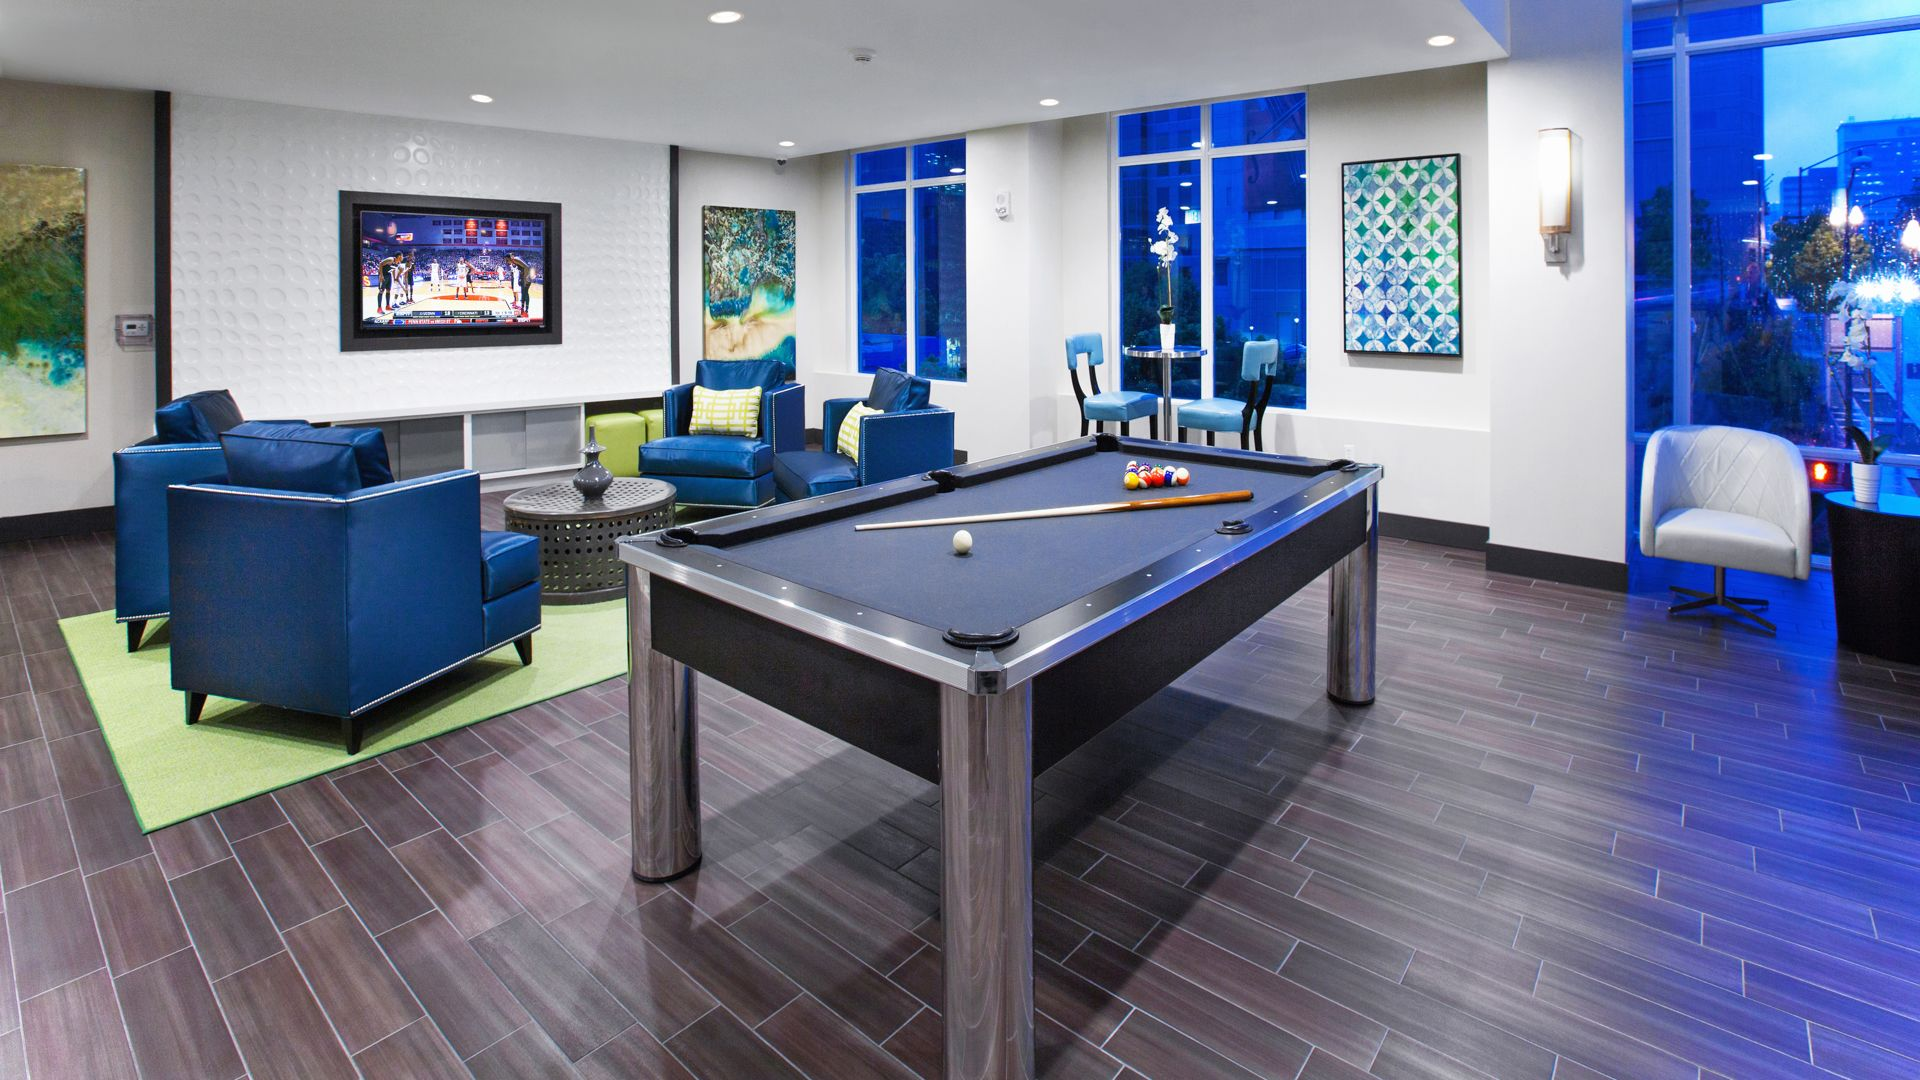 Vantage Pointe Apartments - Lounge